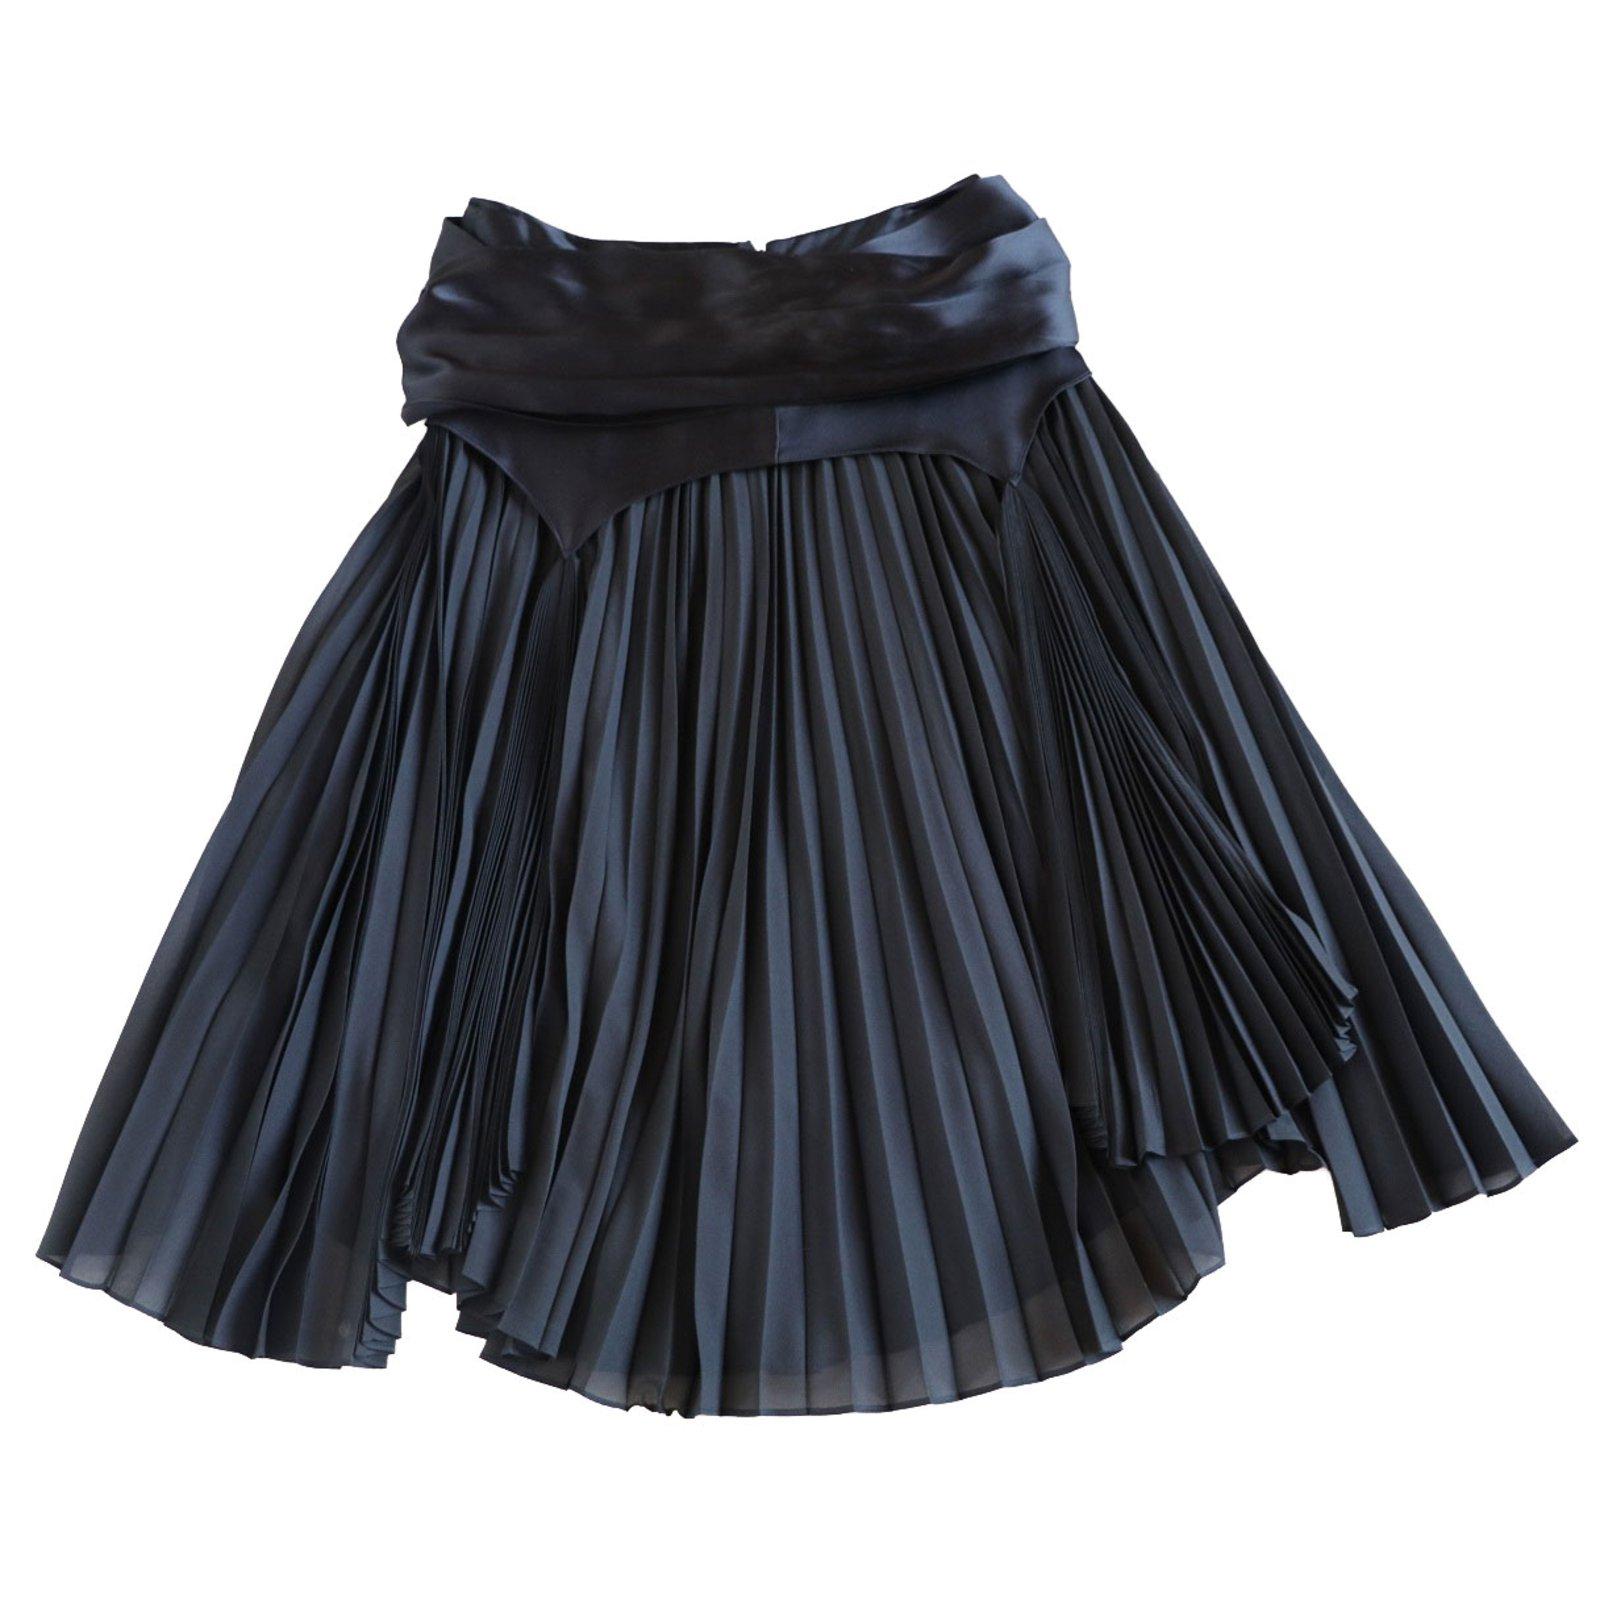 5aeda568309c Yves Saint Laurent Skirts Skirts Silk Black ref.76760 - Joli Closet